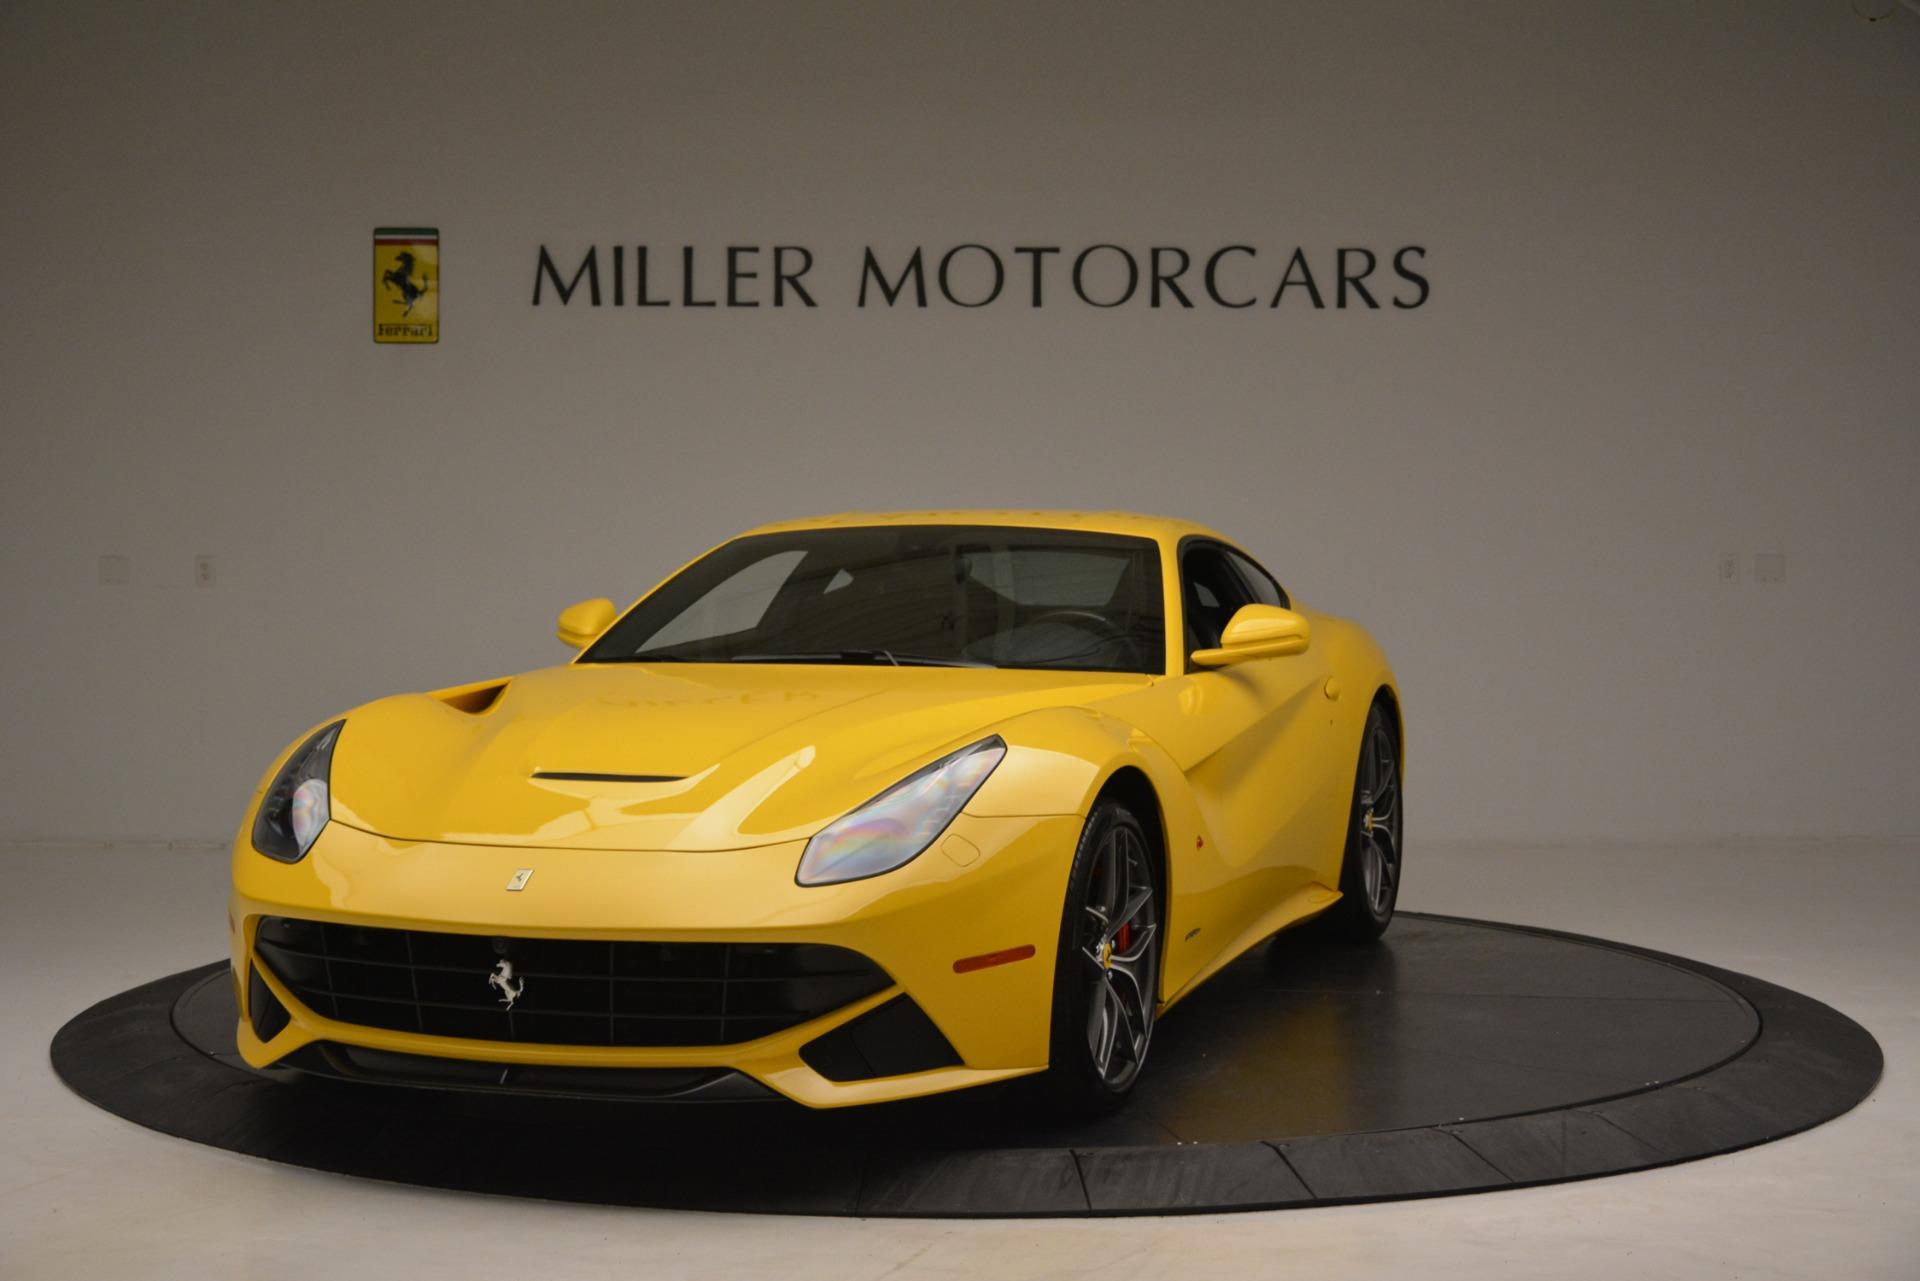 Used 2015 Ferrari F12 Berlinetta for sale $259,900 at Aston Martin of Greenwich in Greenwich CT 06830 1